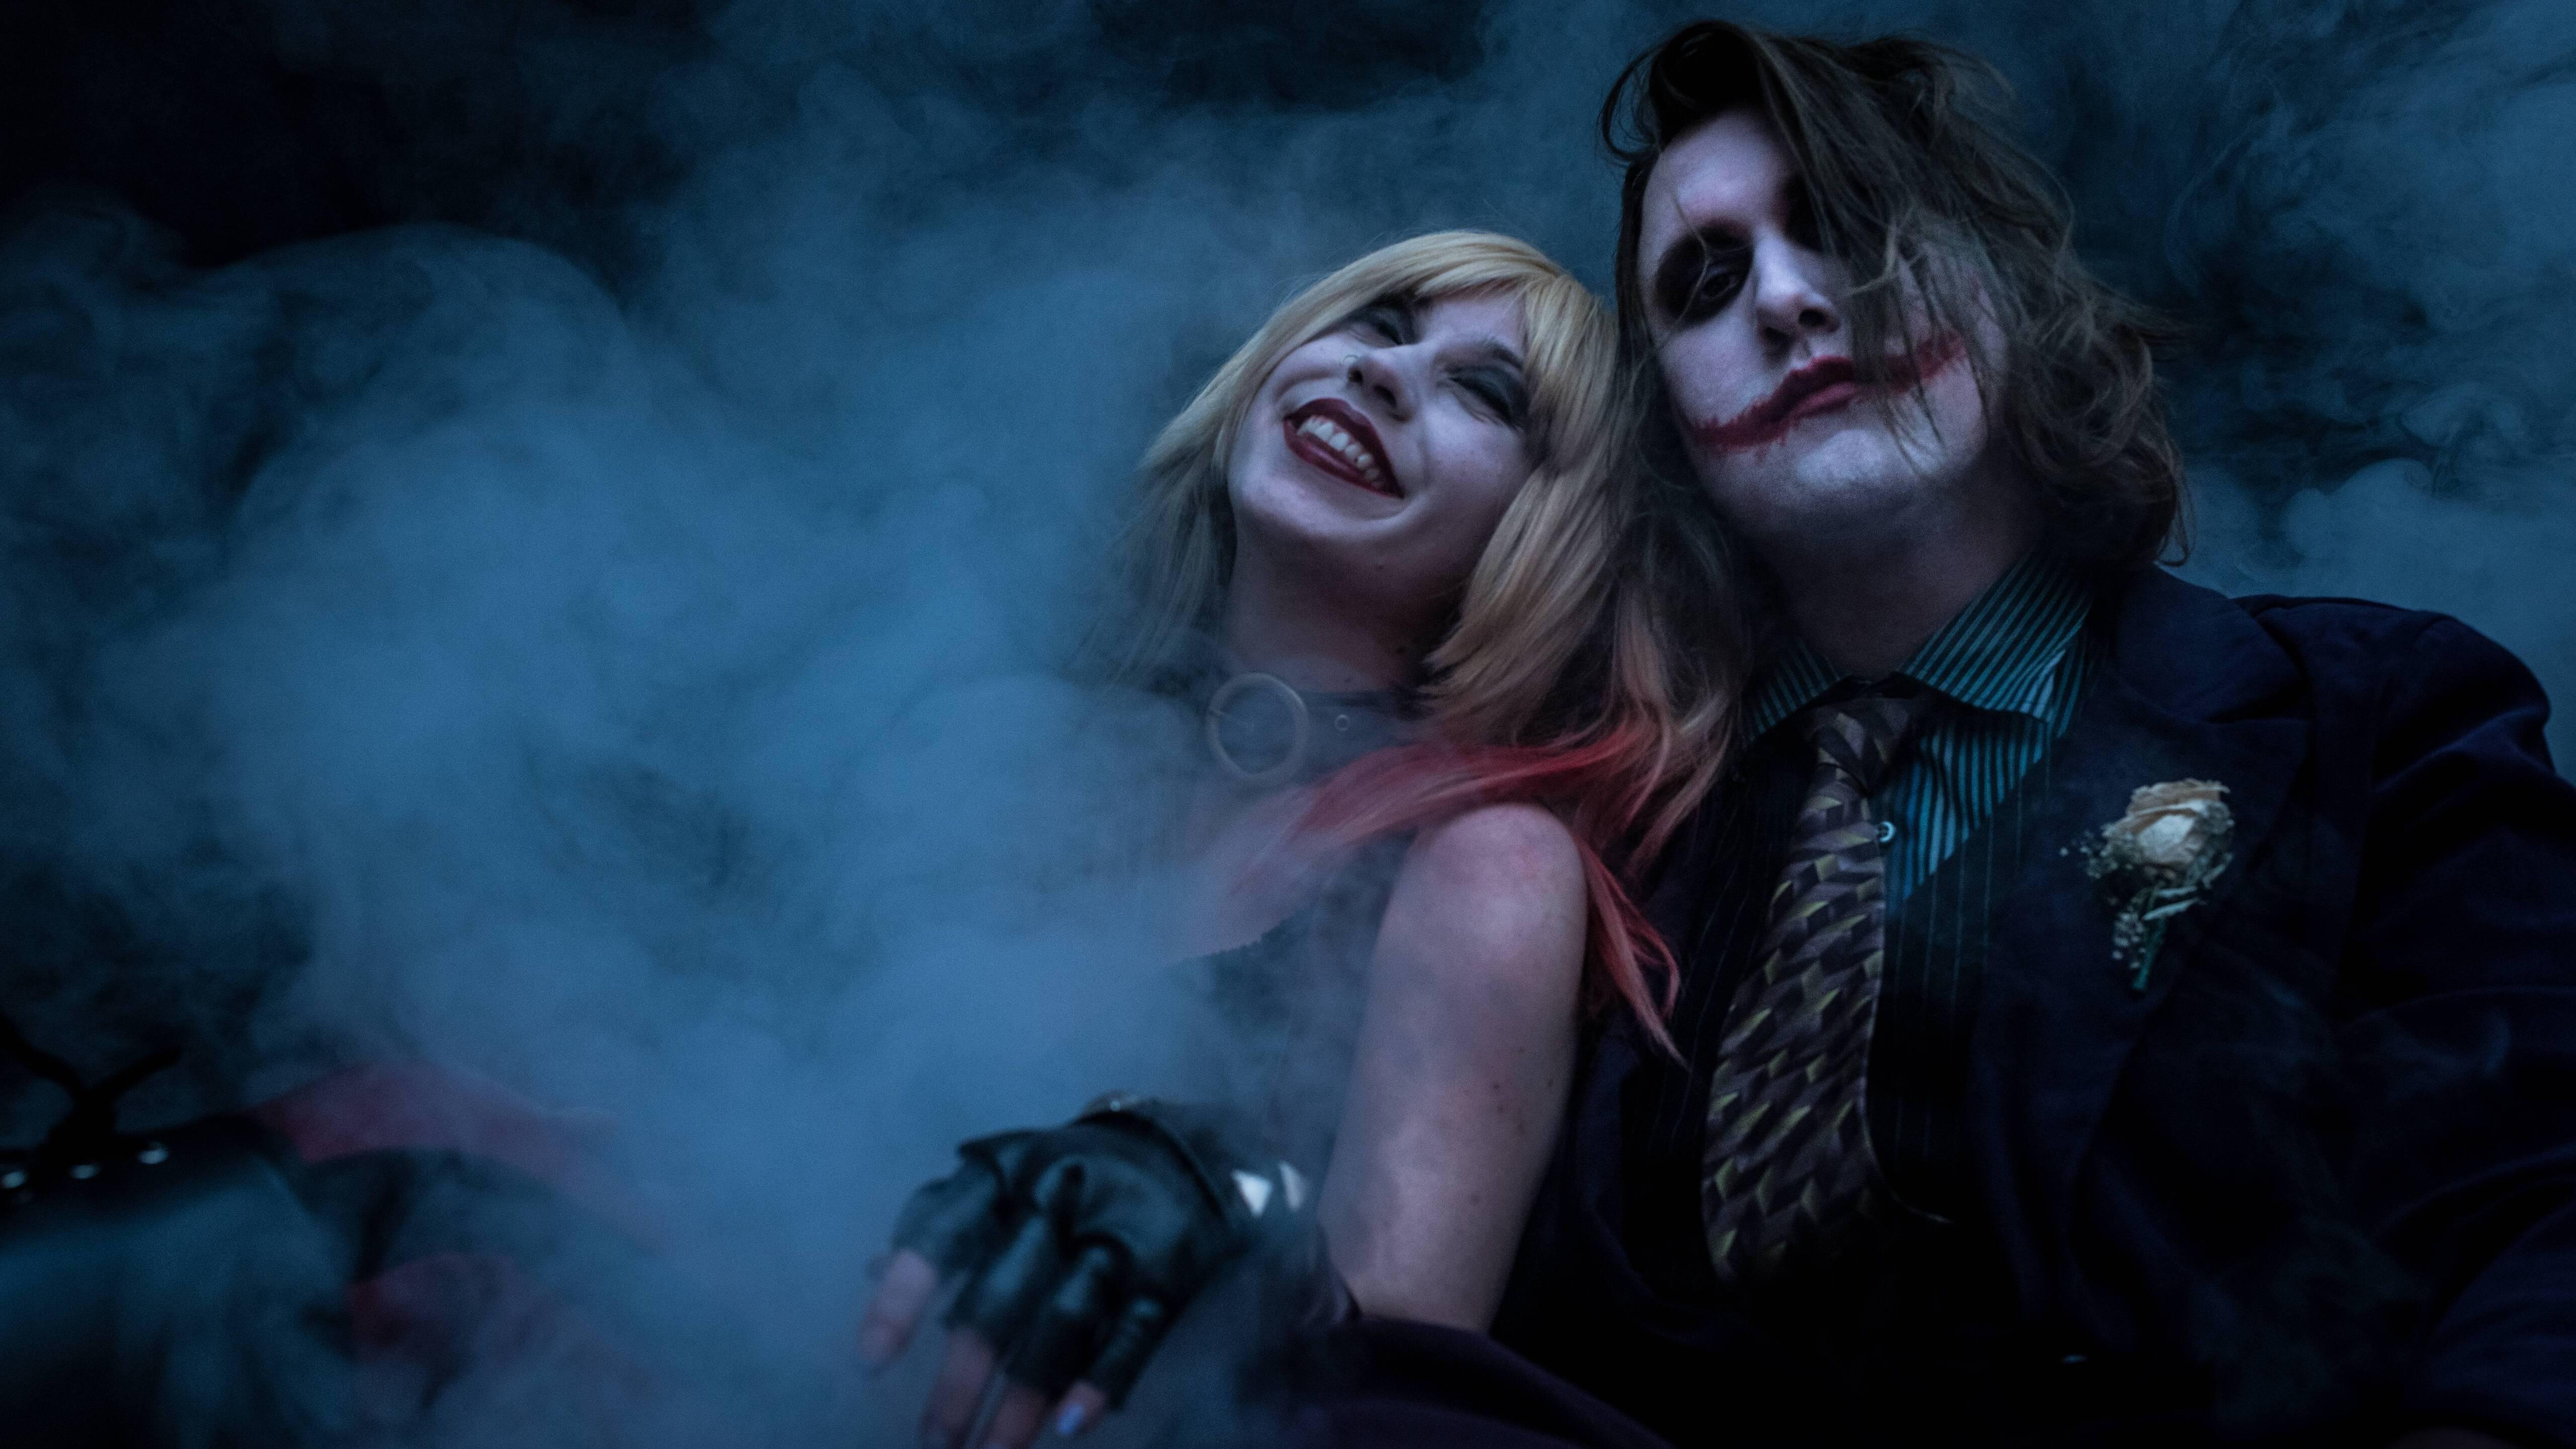 5120x2880 Joker And Harley Quinn 5k Cosplay 5k HD 4k ...